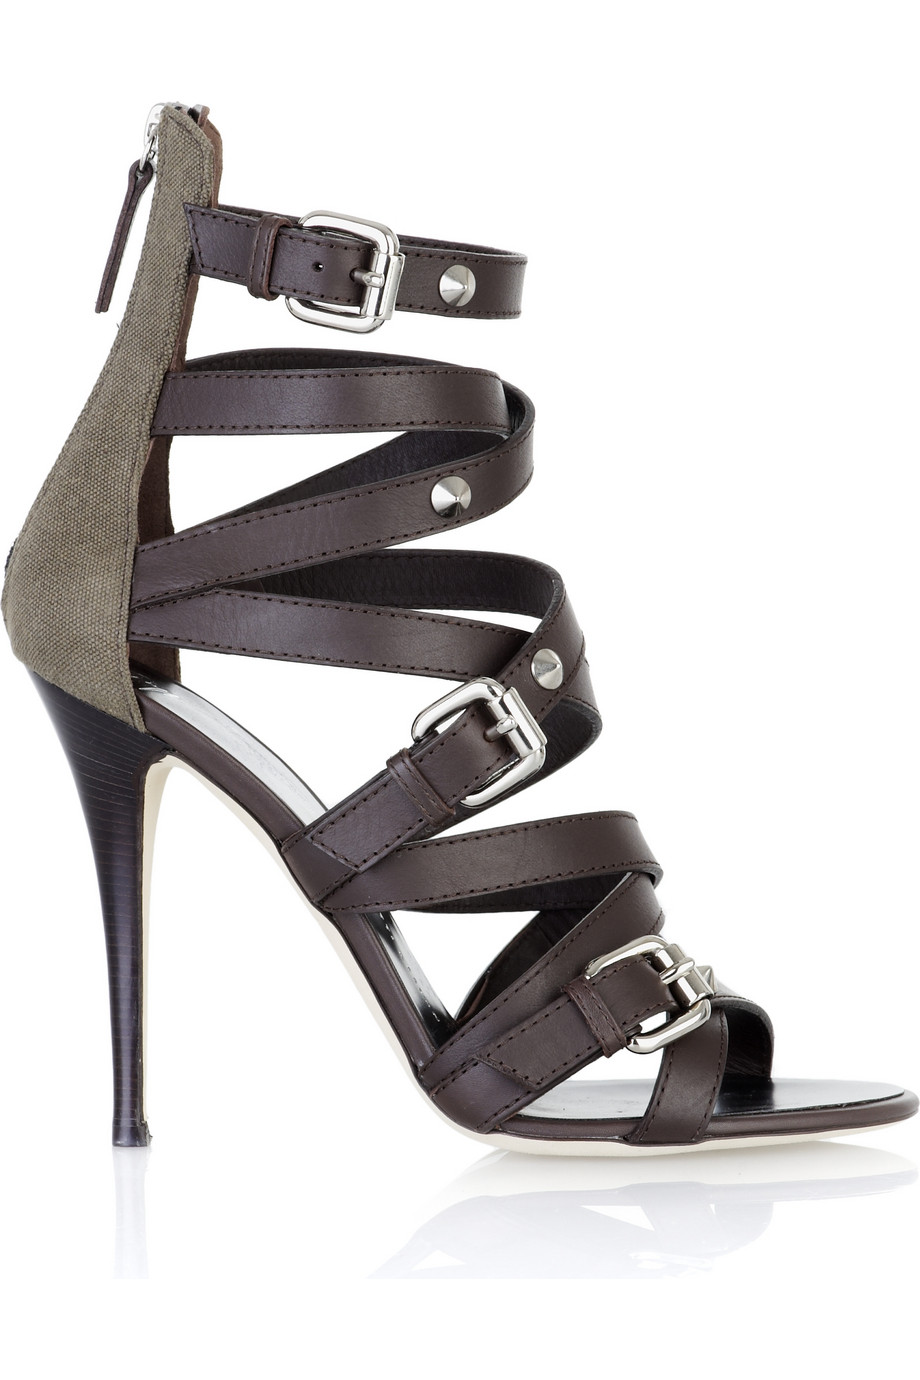 Giuseppe Zanotti Strappy Leather Sandals In Brown Dark